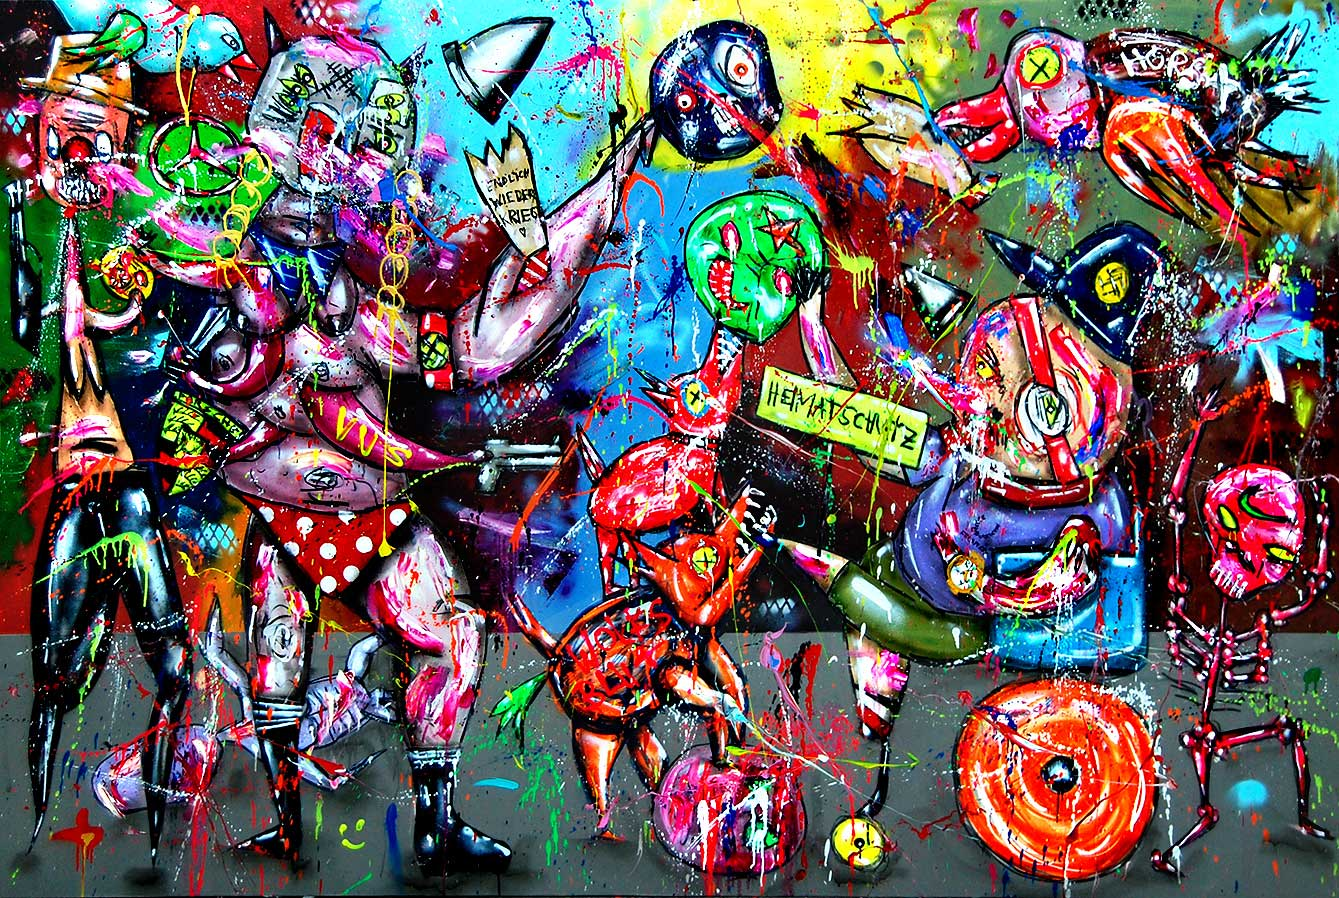 HEIMATSCHUTZMINISTERIUM mixed media on canvas 2018 · 200 x 300 cm